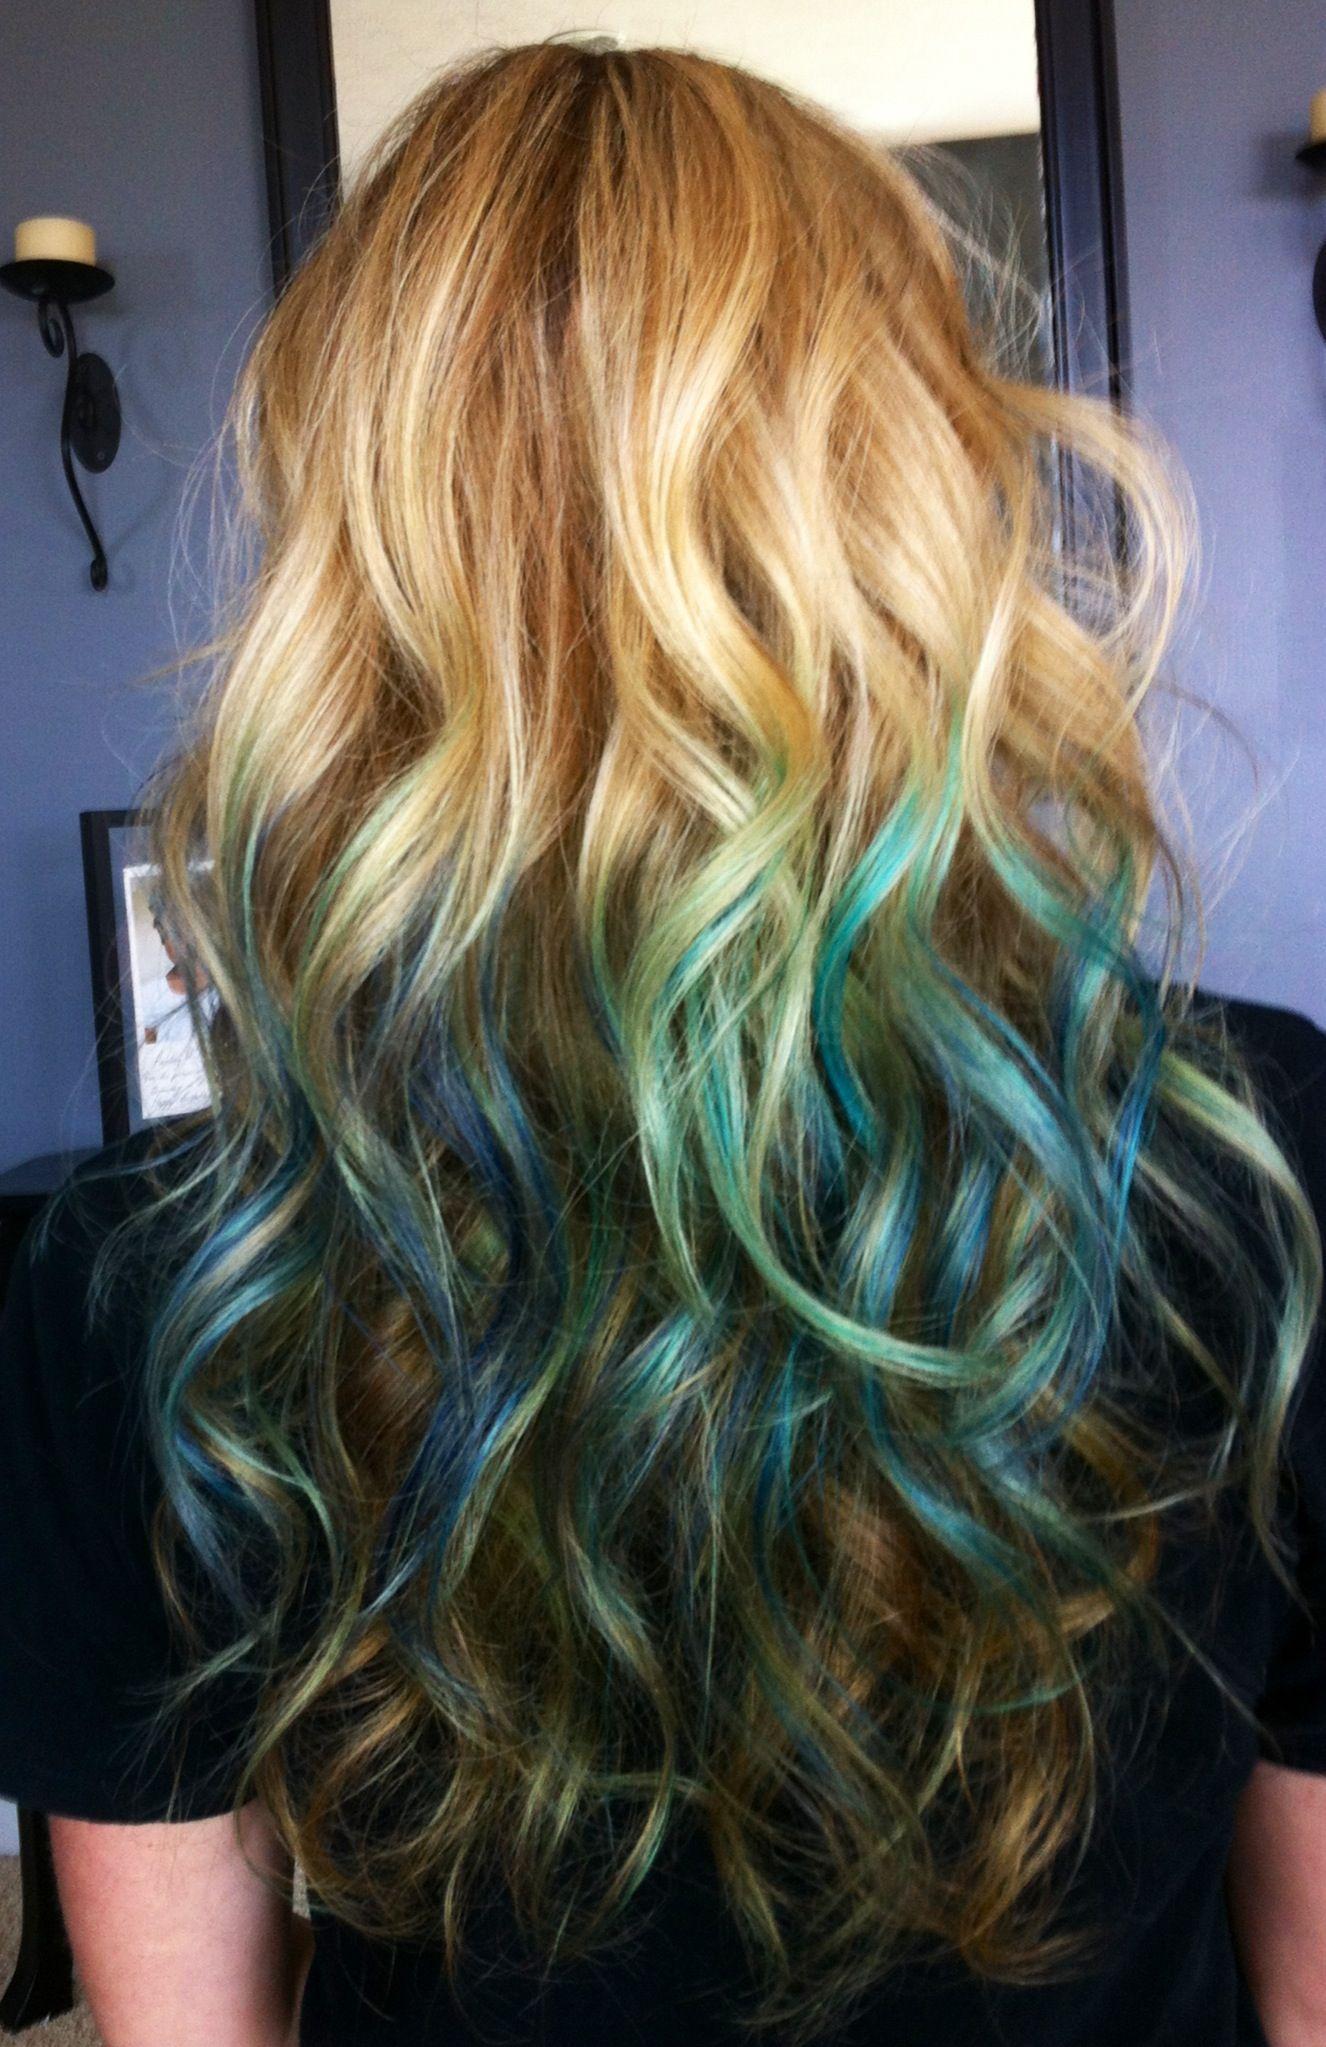 My Kool aid Hair Ice Blue Rasberry Lemonade and Mixed Berry Put